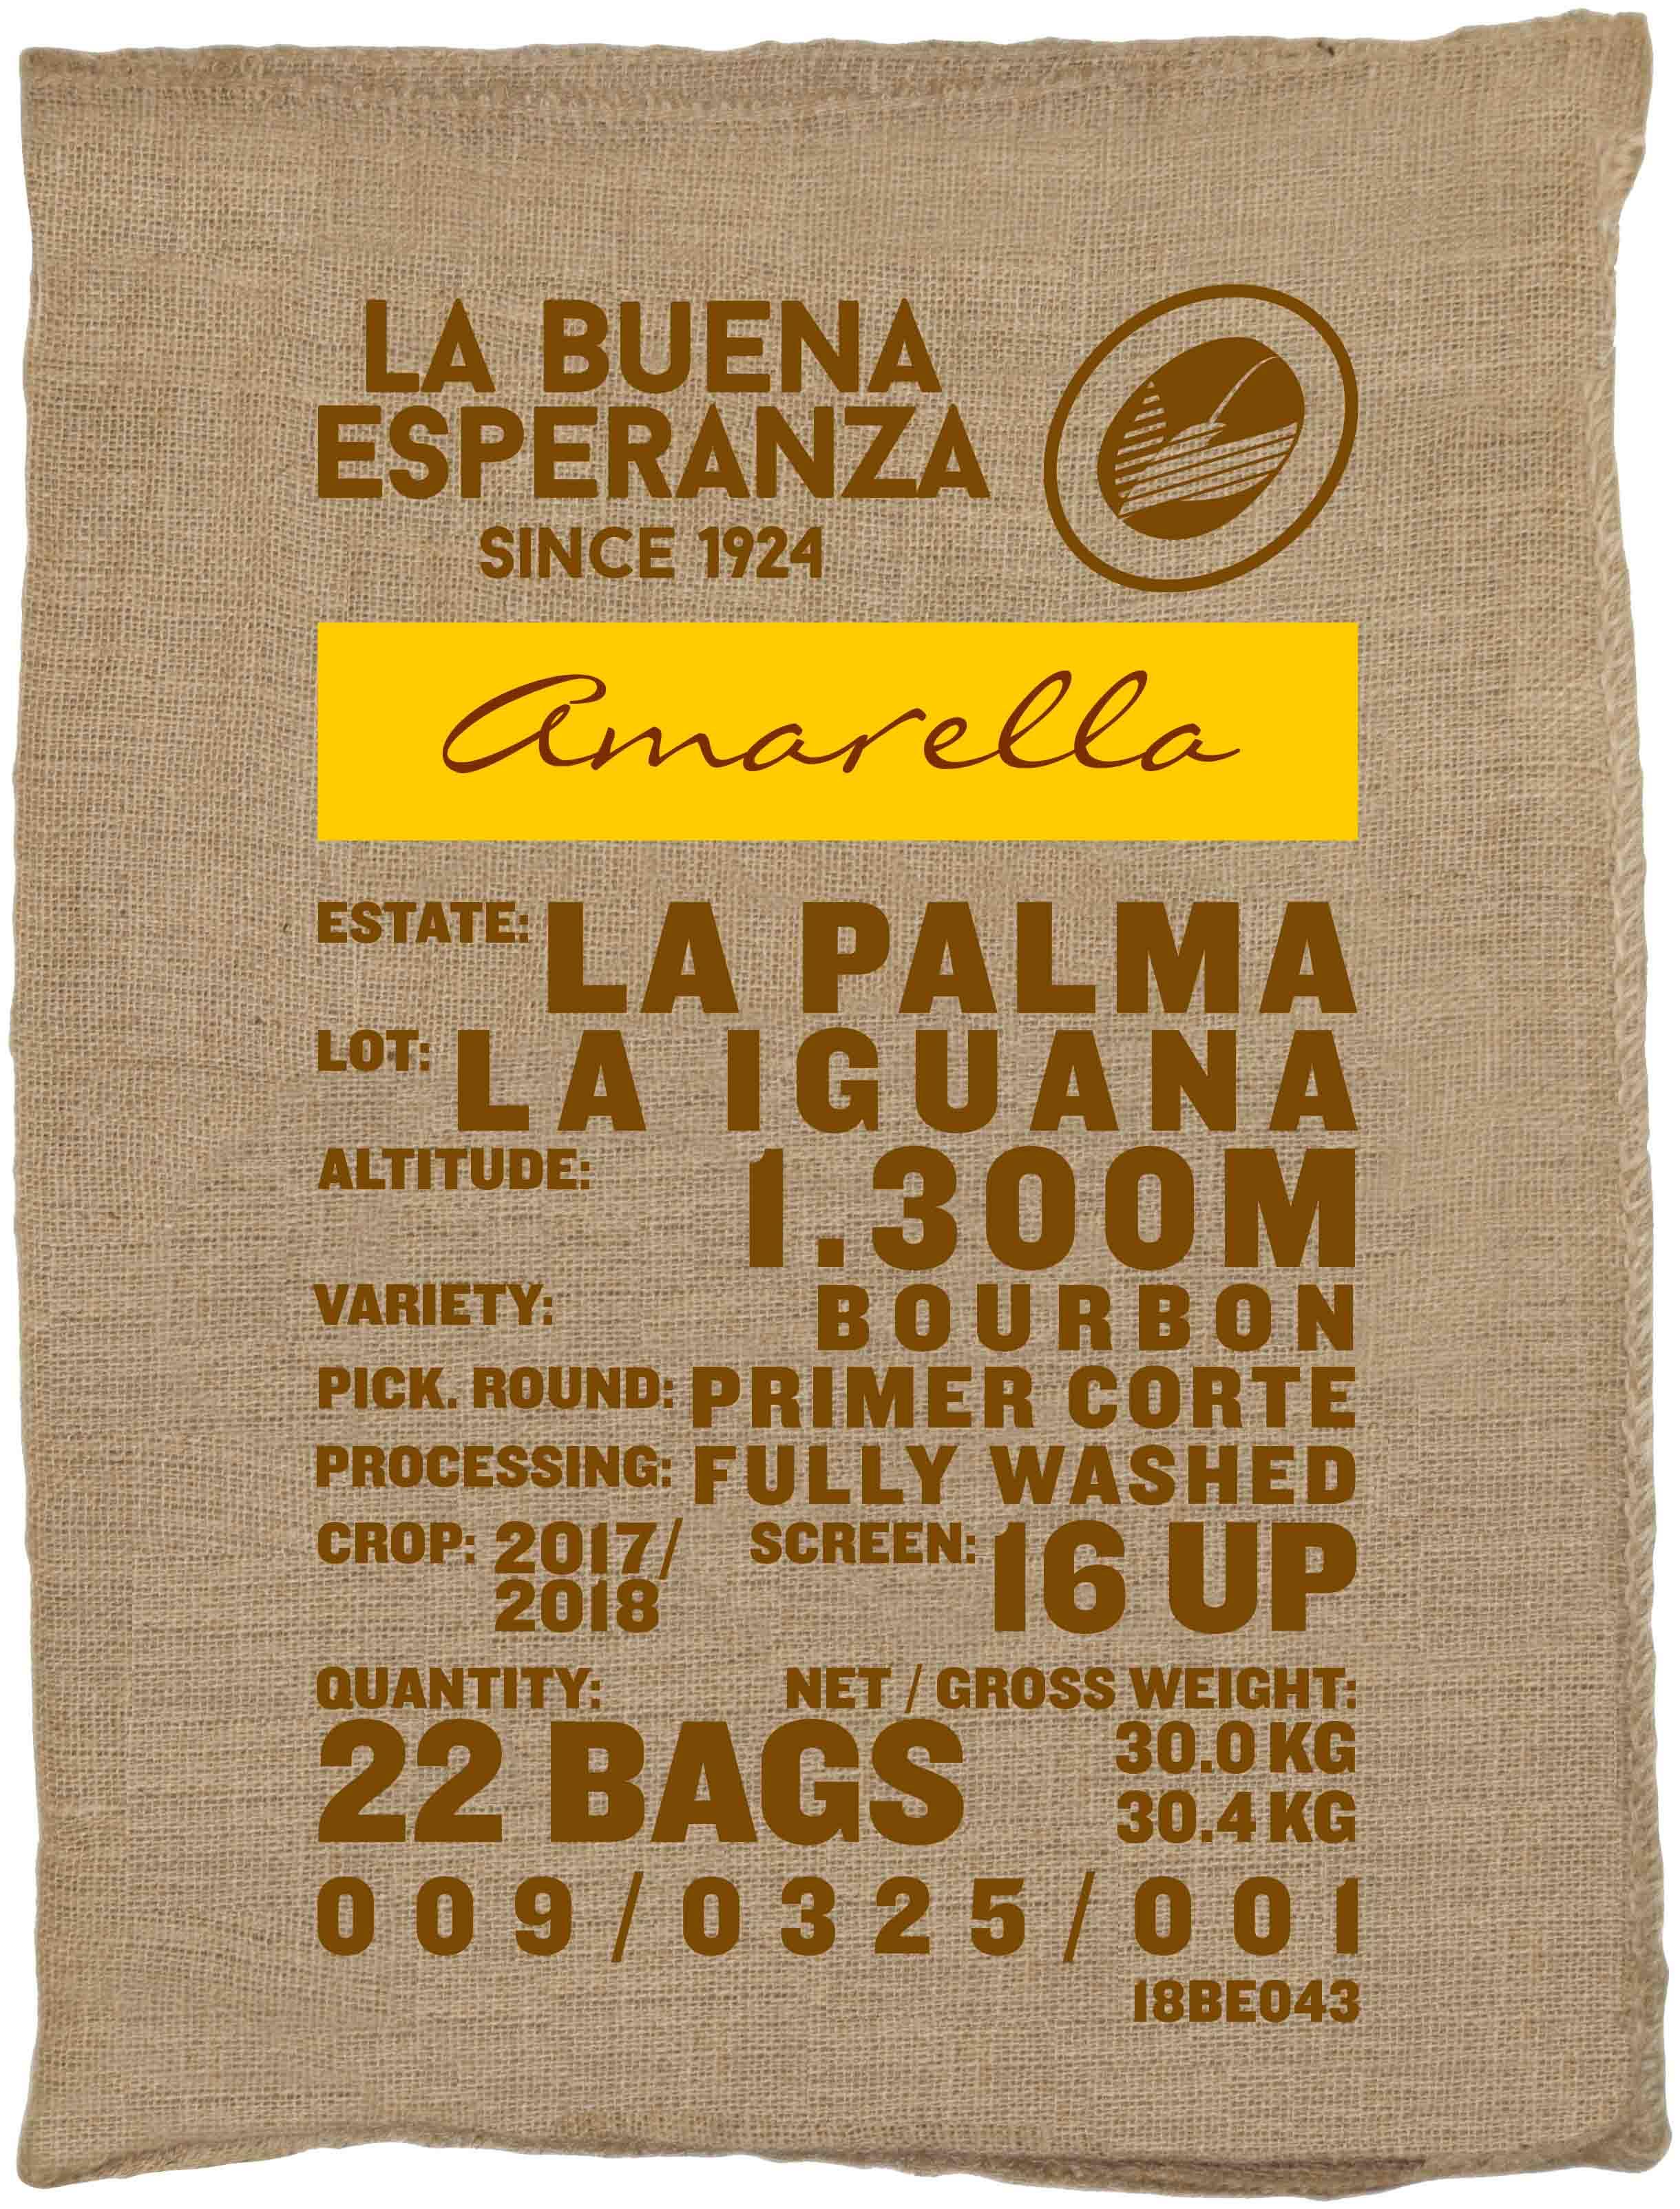 Ein Rohkaffeesack amarella Parzellenkaffee Varietät Bourbon. Finca La Buena Esperanza Lot La Iguana.